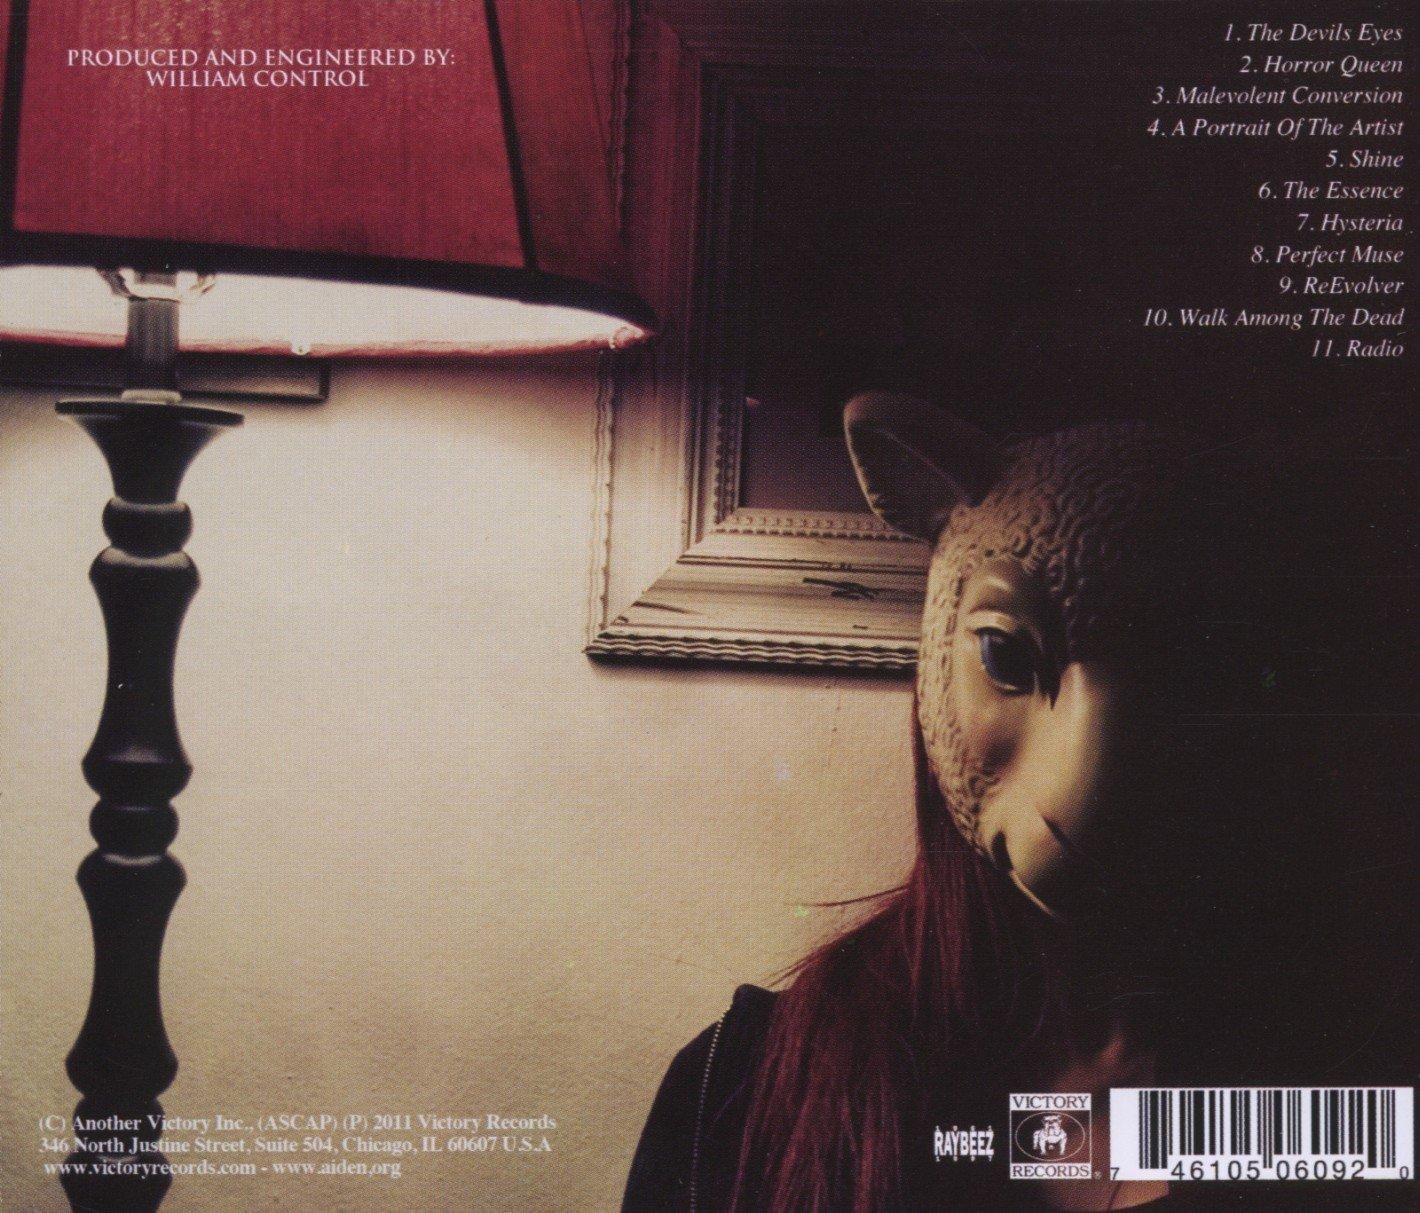 Aiden - Disguises - Amazon.com Music